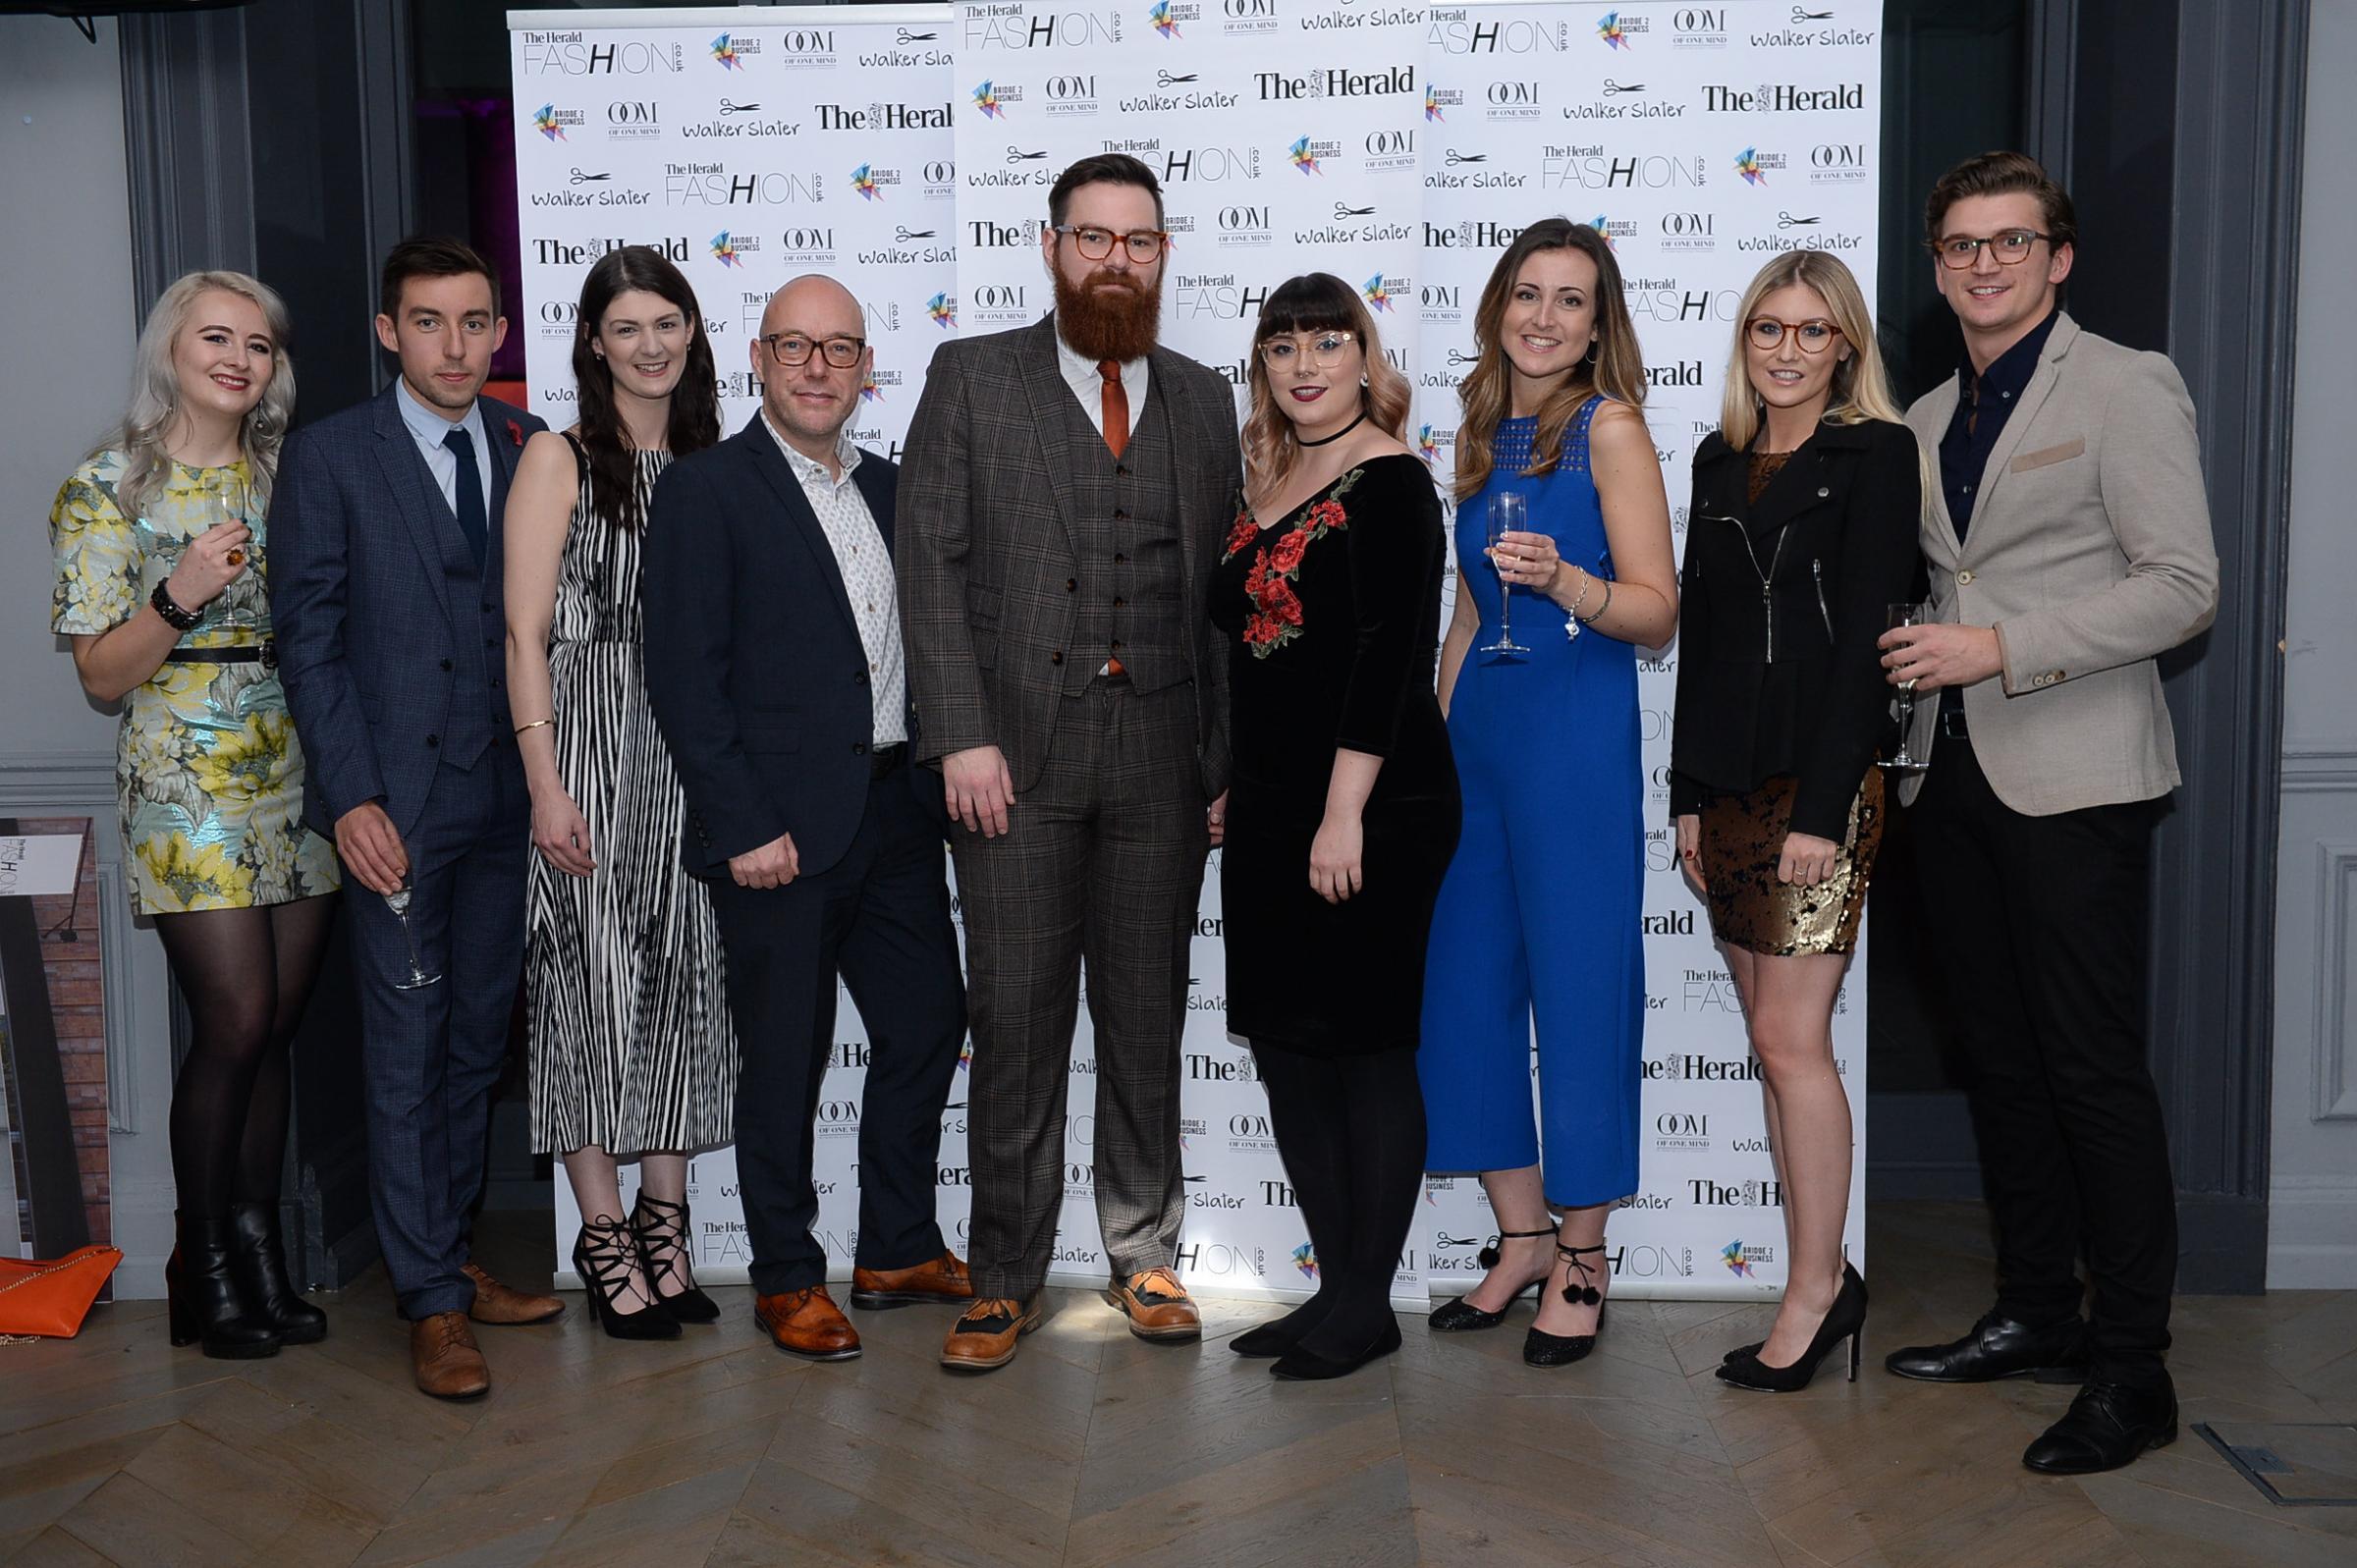 Herald scotland online dating blog sites